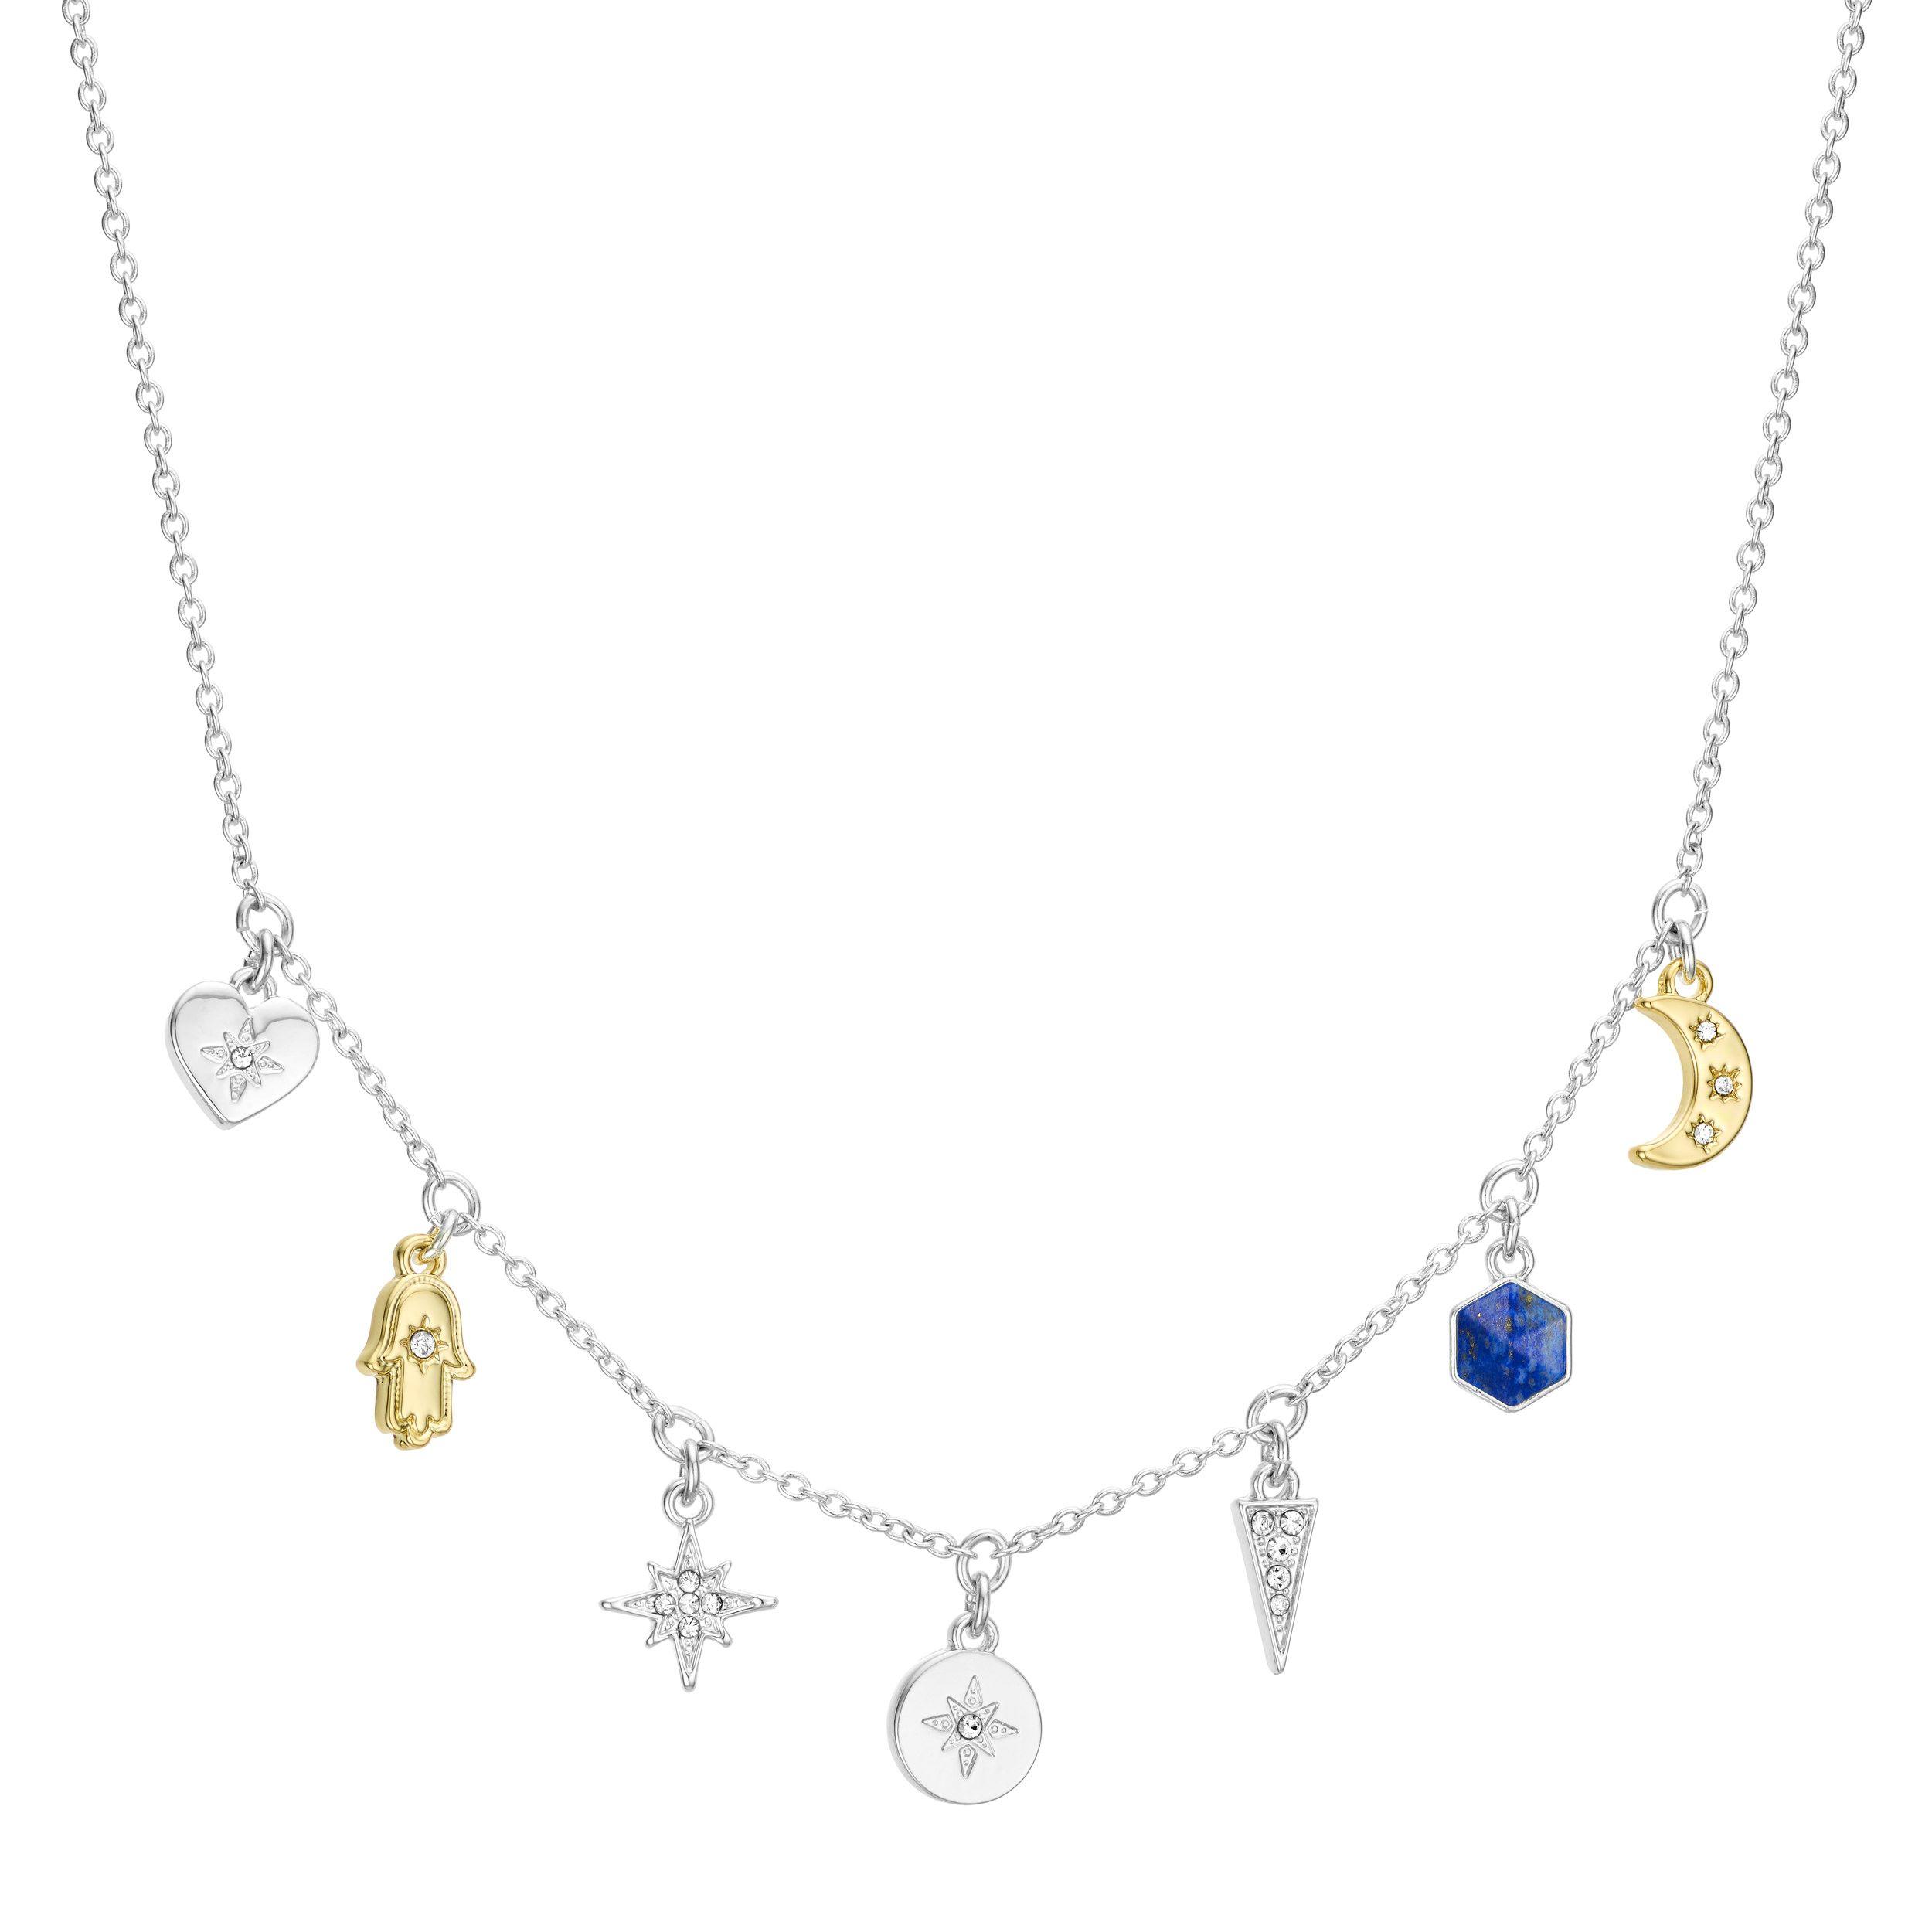 Buckley London Stargazer Charm Necklace